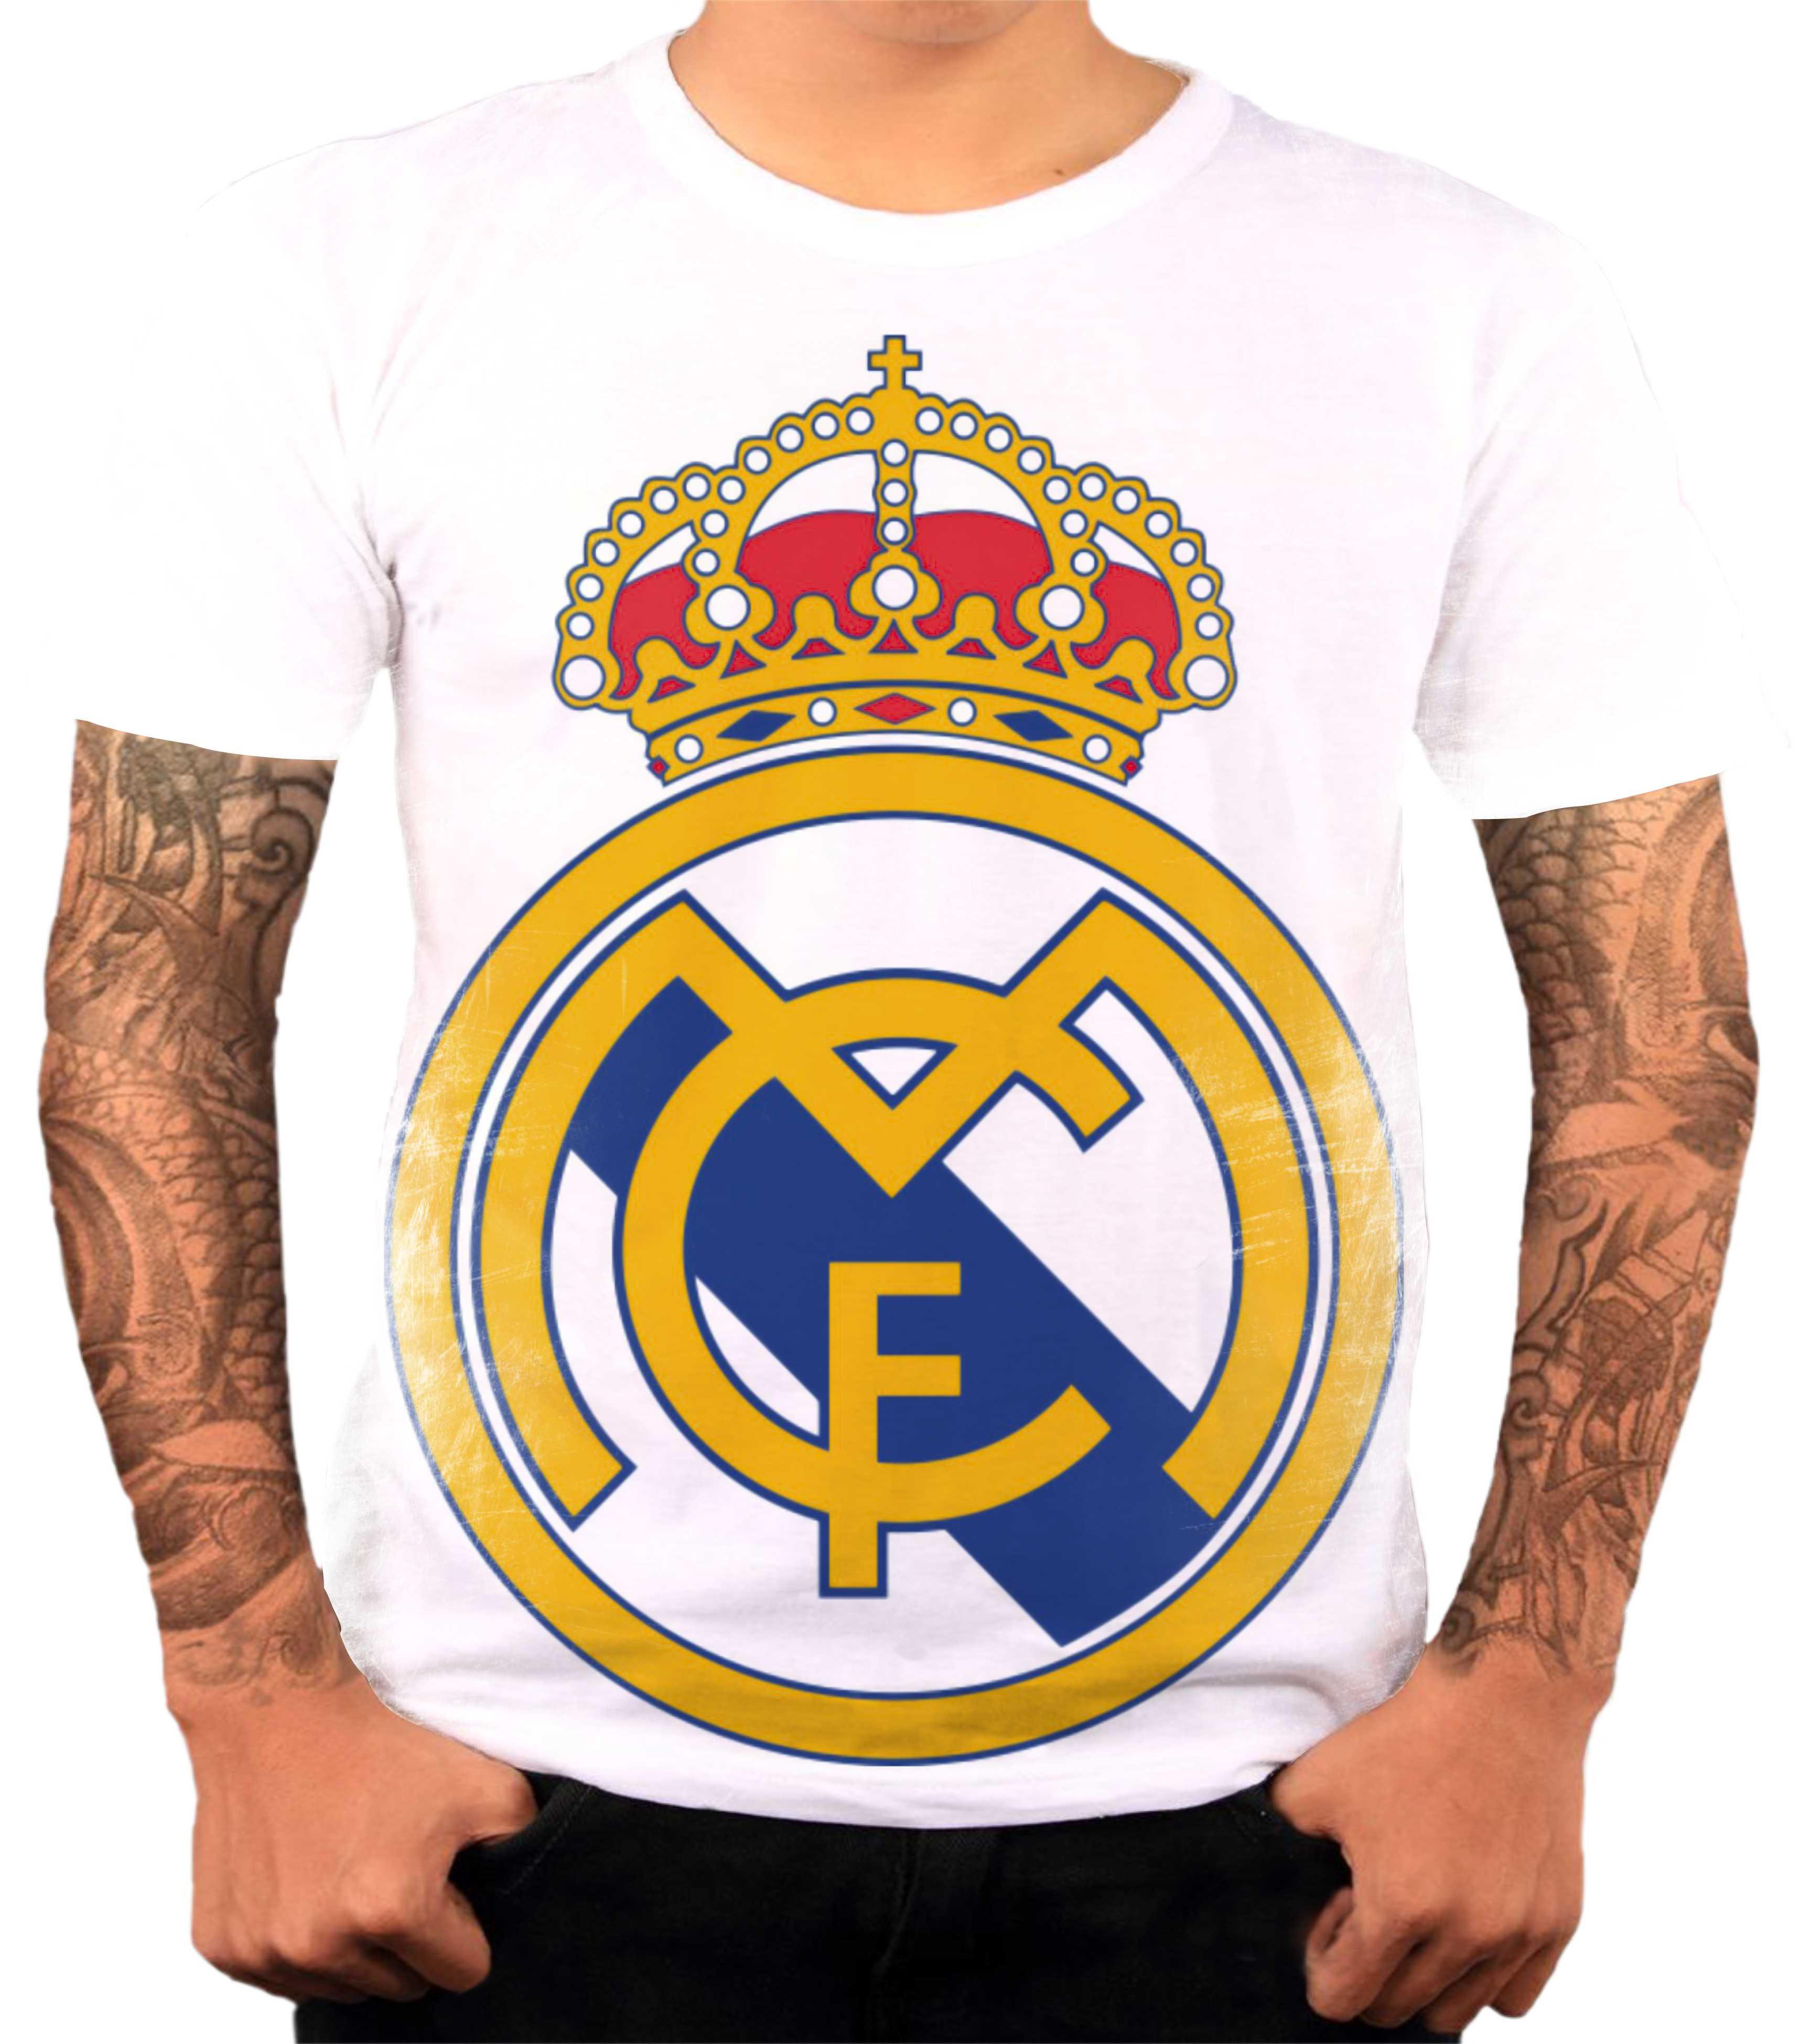 2e55d9f306 Camisa Camiseta Personalizada Time de Futebol Real Madrid 3